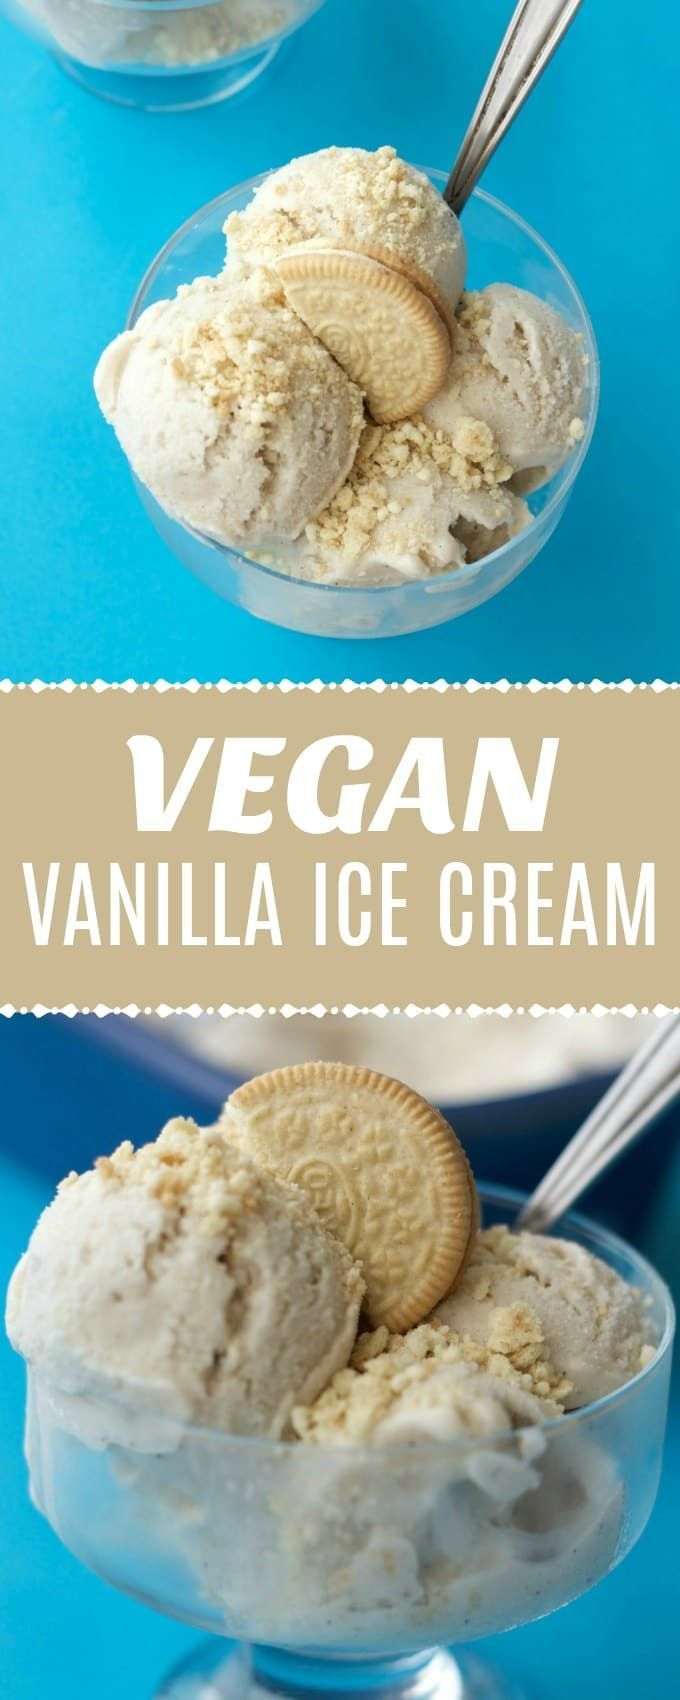 Ultra creamy vegan vanilla ice cream. So easy to make with the most perfectly smooth, rich, melt-in-the-mouth ice cream texture. | lovingitvegan.com #healthyicecream